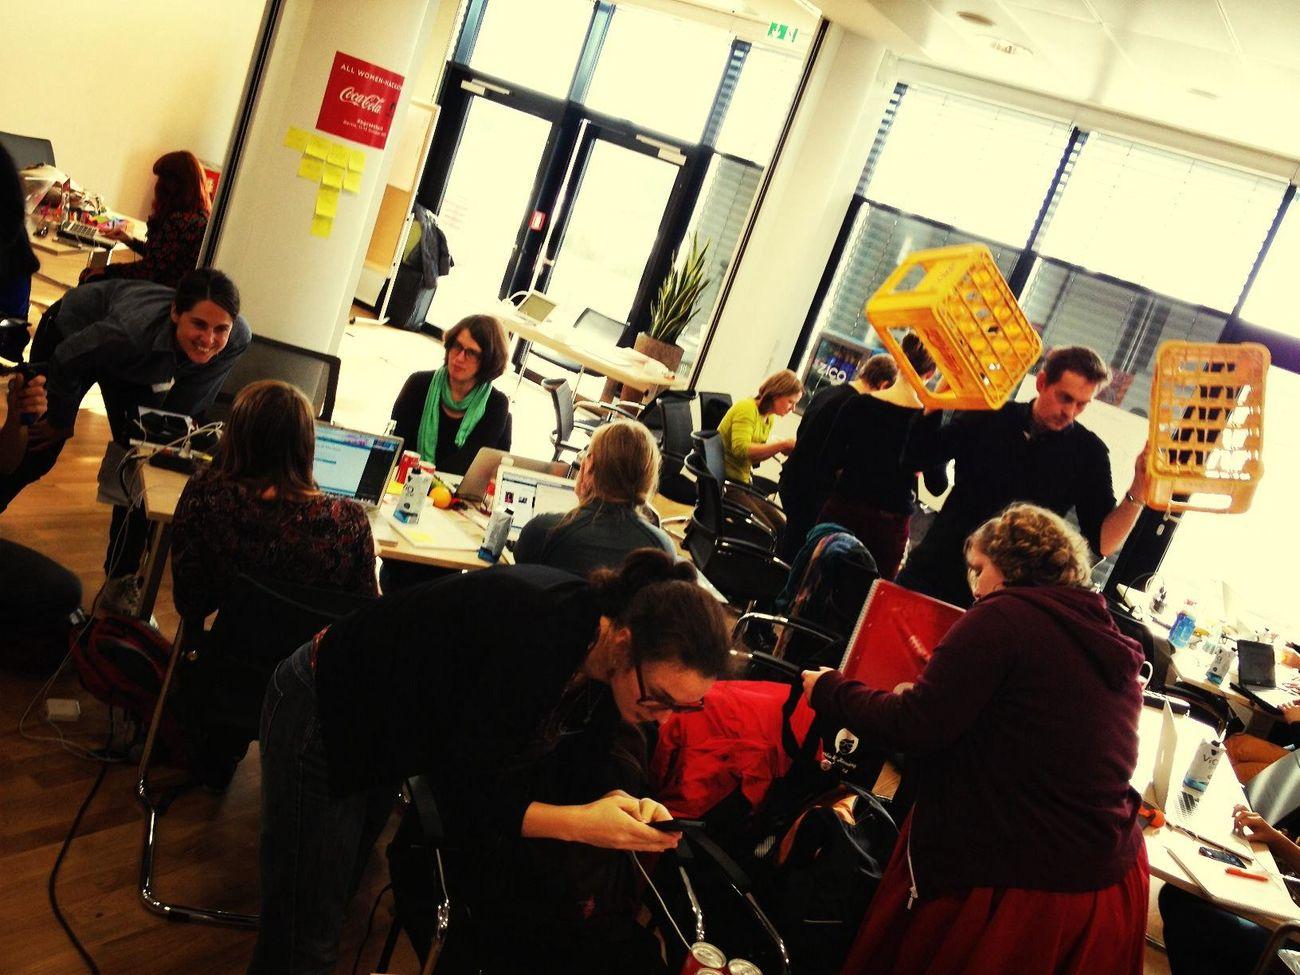 Berlingeekettes GeeketteGeekettes Berlingeekette